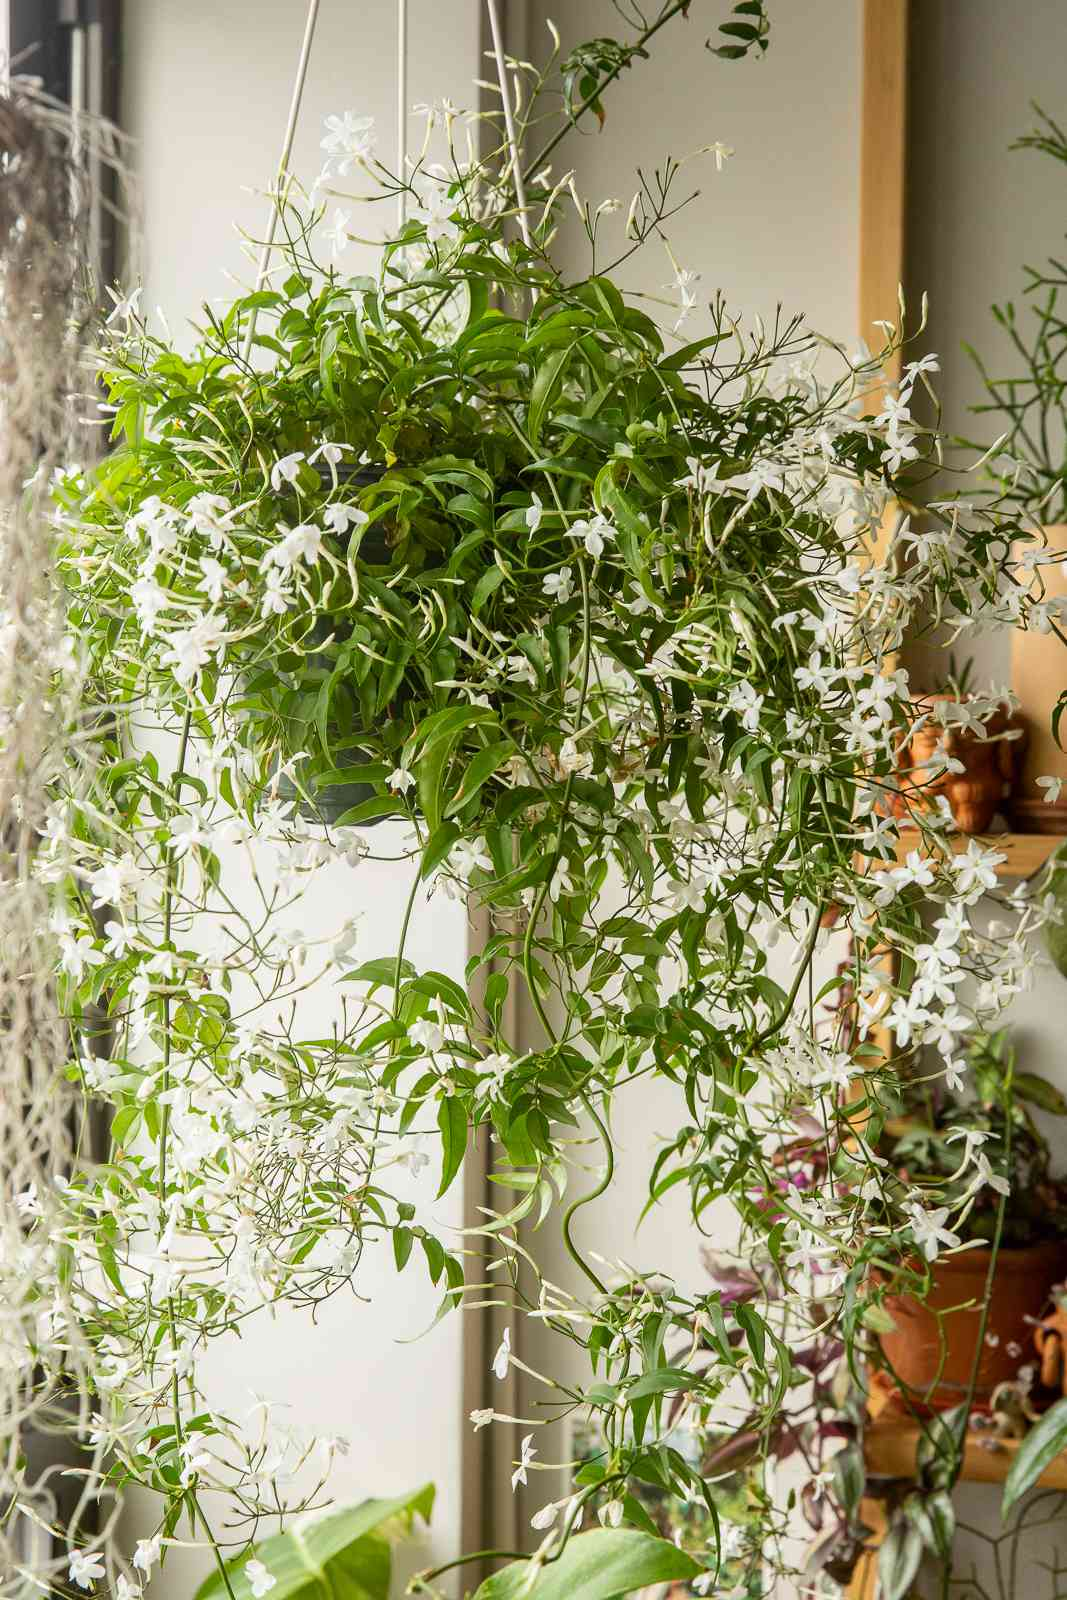 Jasmine plant with hanging vines